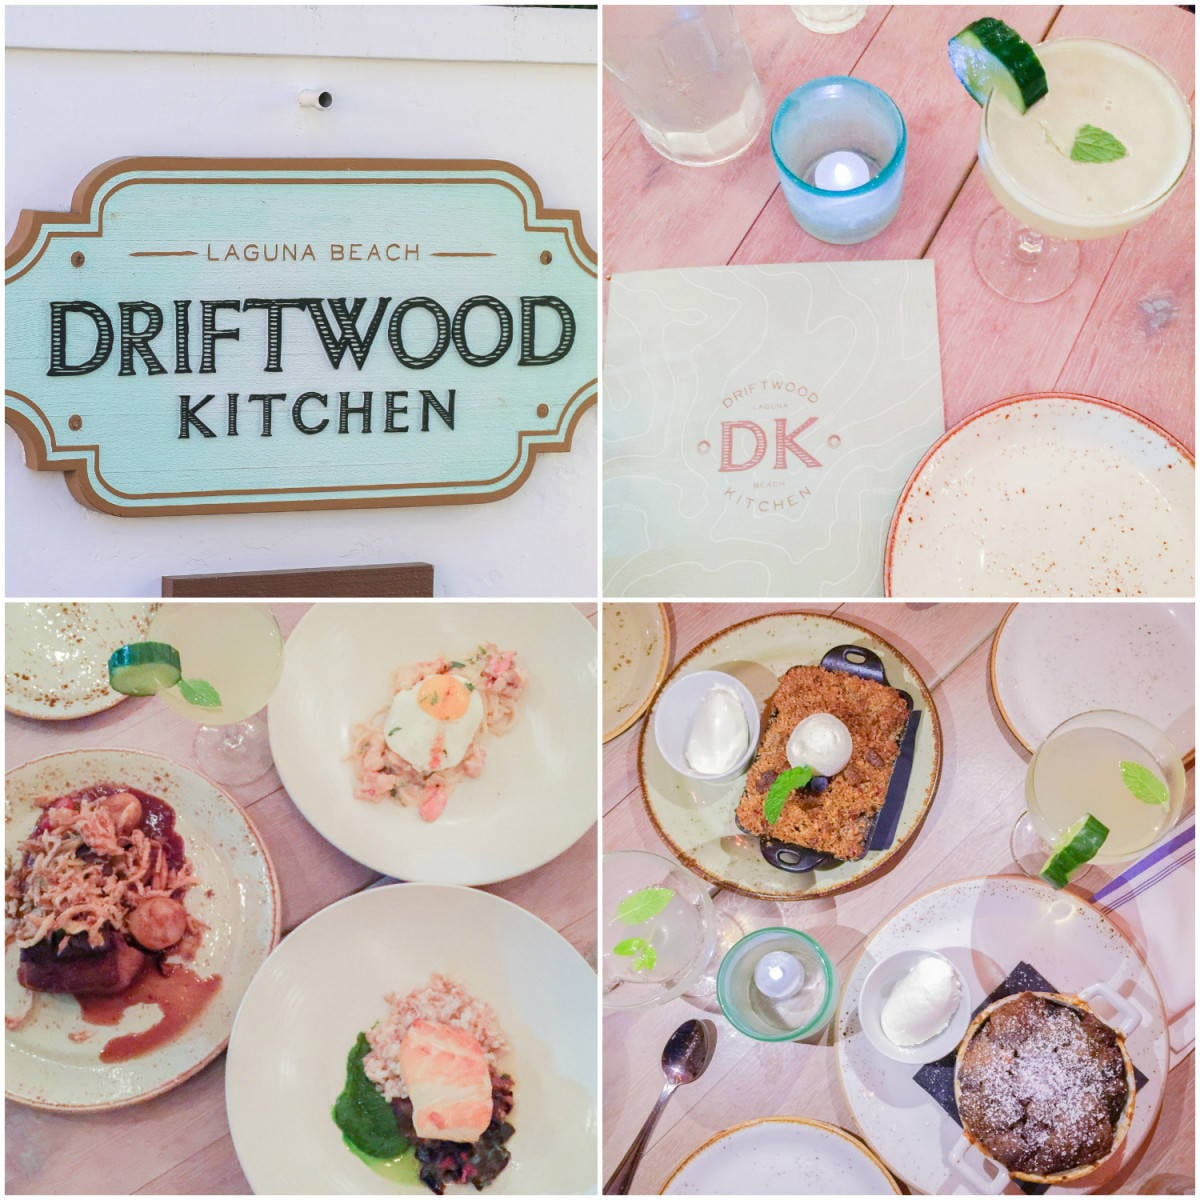 driftwood-kitchen-laguna-beach-california